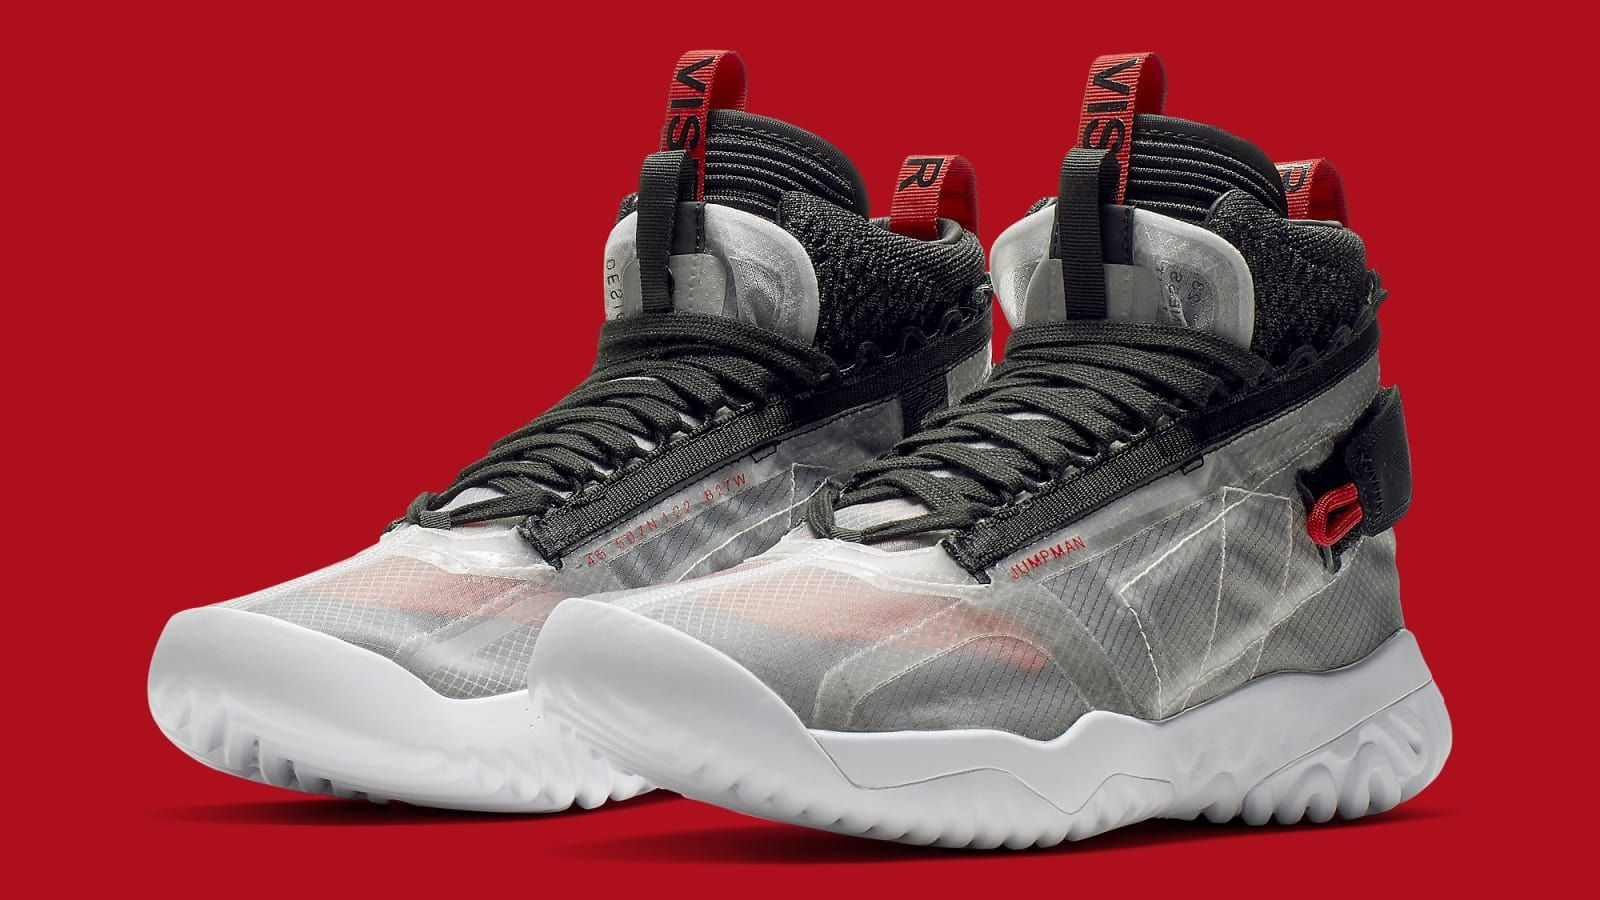 Jordan Apex Utility Black Red Release